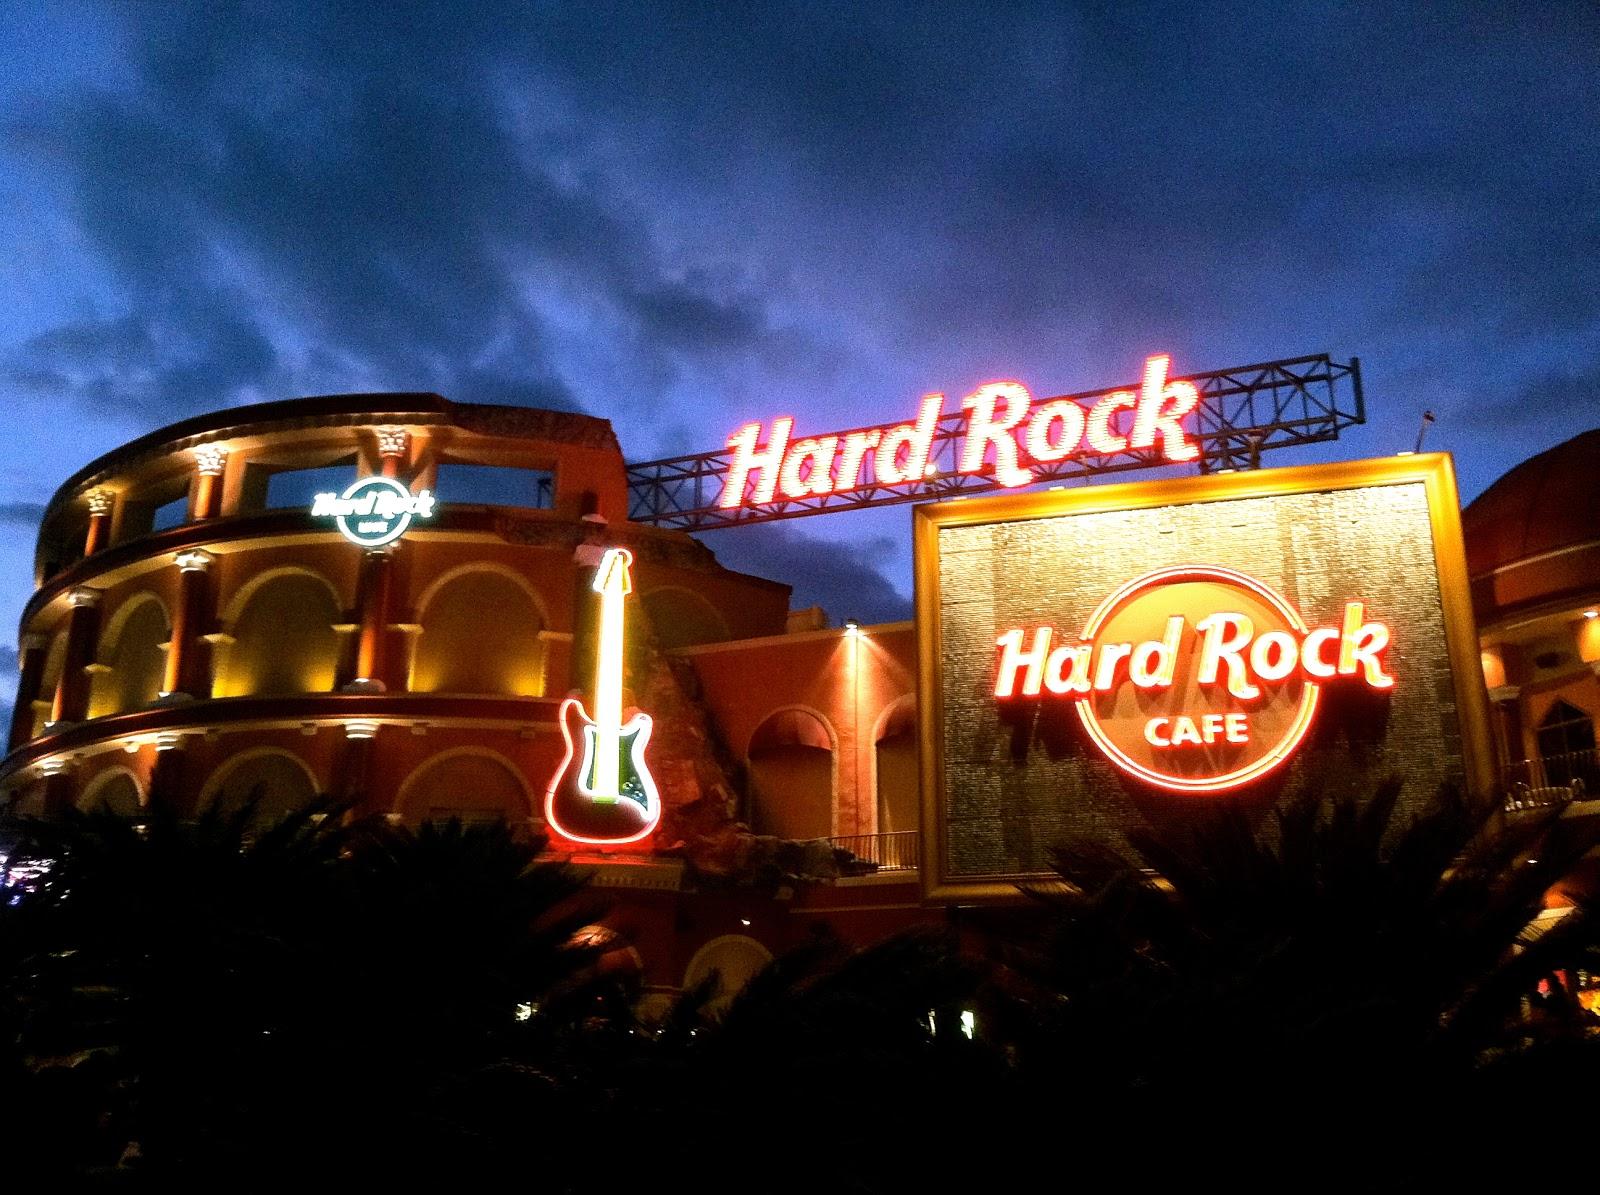 Hard Rock Cafe - My Travel Guilty Pleasure ~ The World of Deej